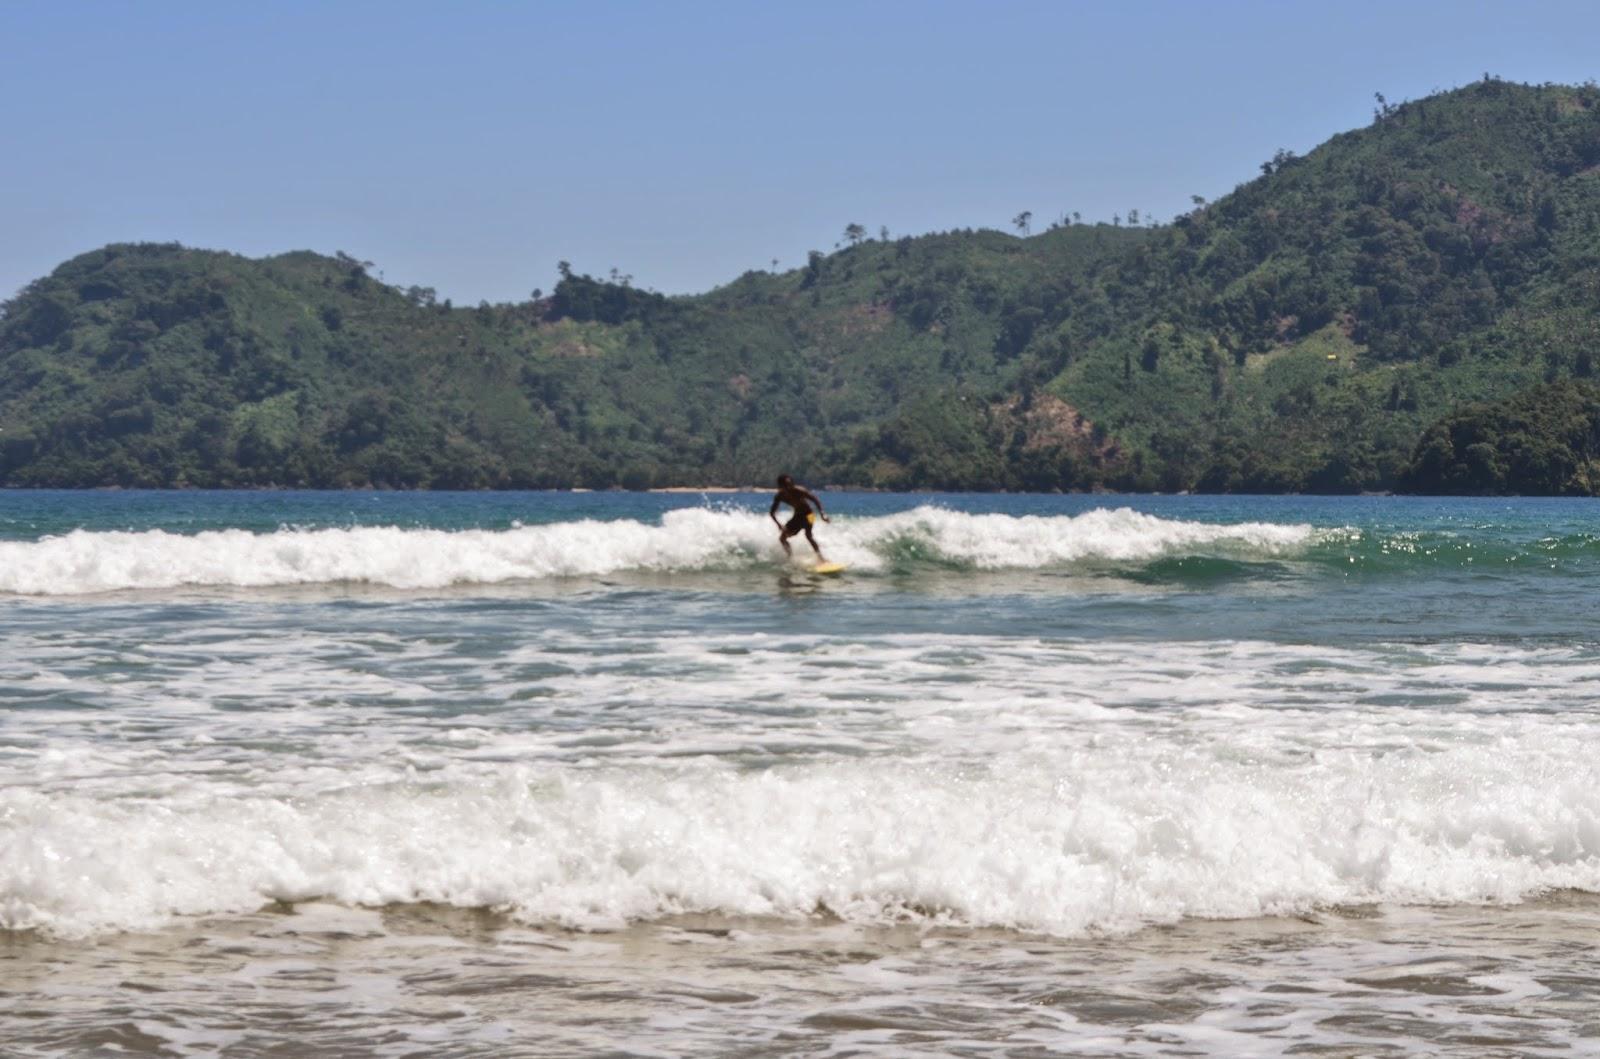 Pantai Lenggoksono Bolu Surga Tersembunyi Tips Kamu Bilang Aja Temen